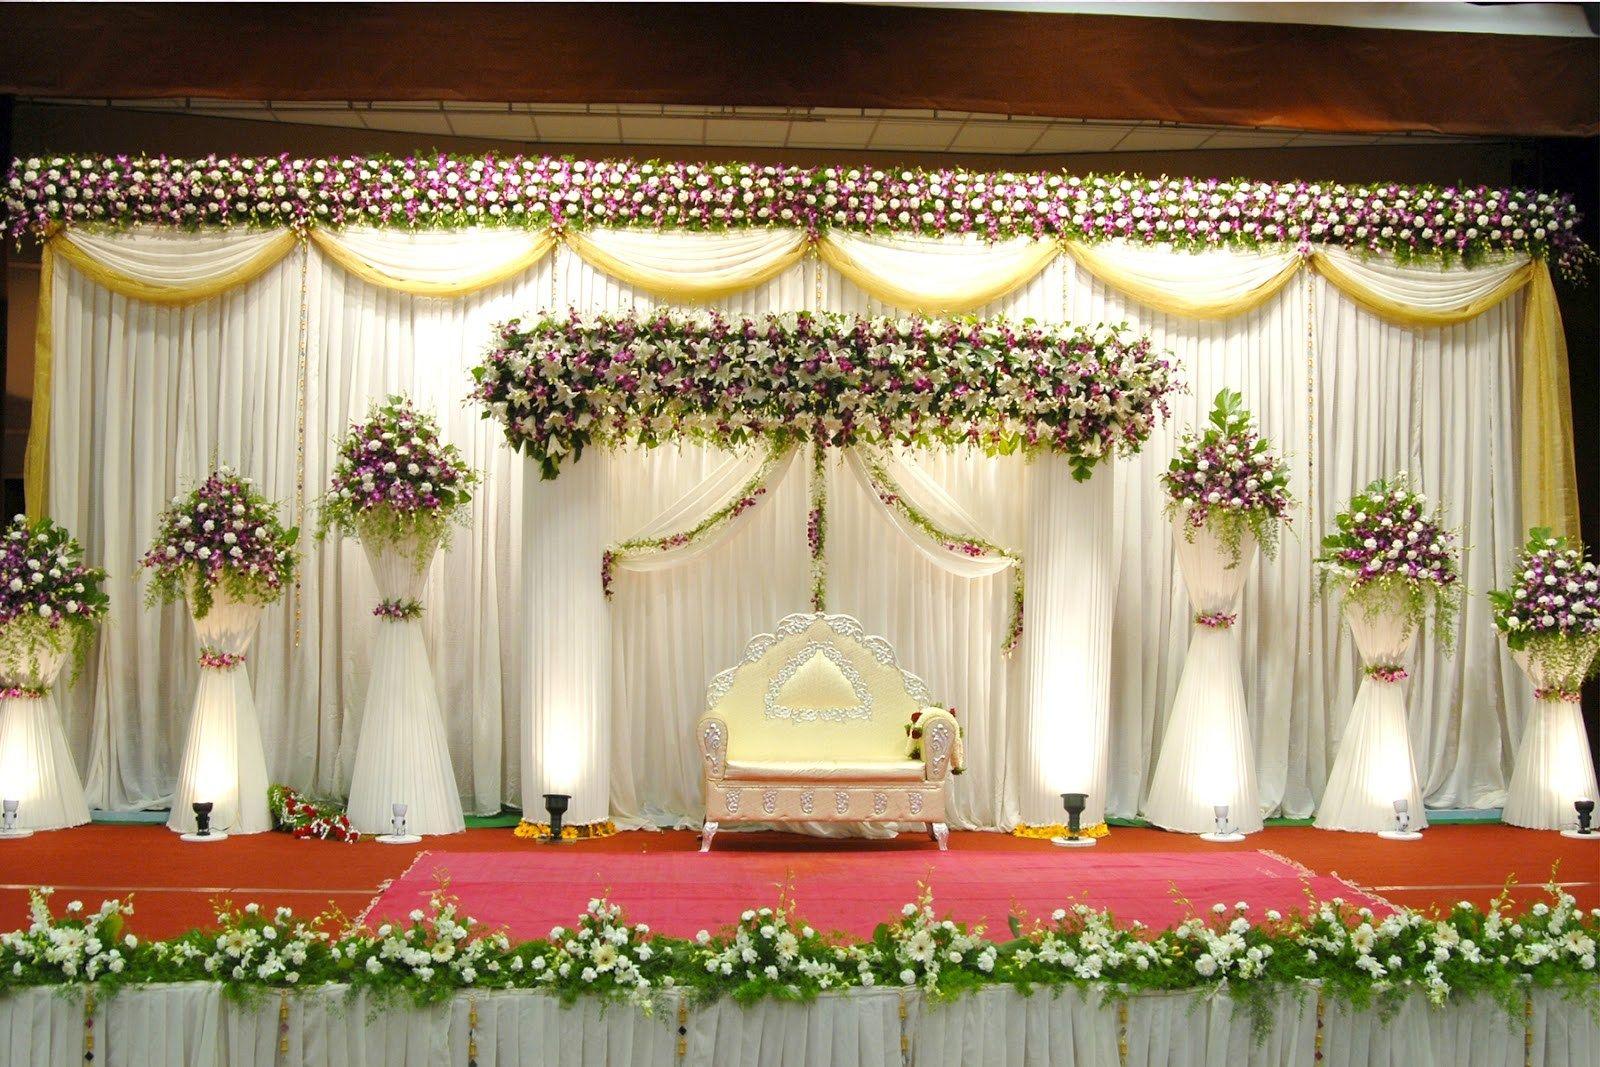 Wedding reception simple stage decoration  Simple wedding decor is trending nowadays floraldecor wedding